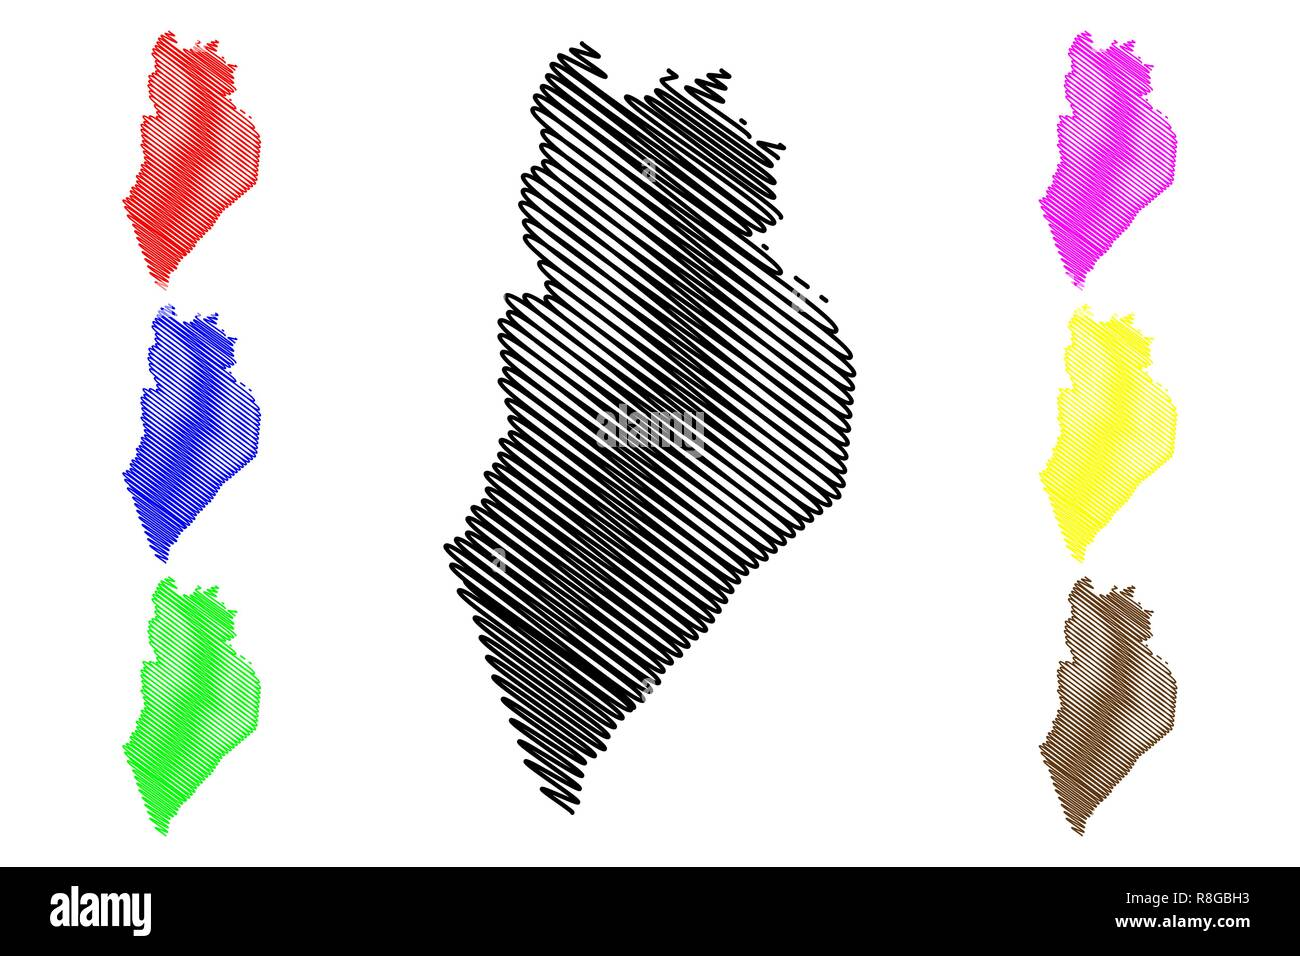 Perlis (States and federal territories of Malaysia, Federation of Malaysia) map vector illustration, scribble sketch Perlis Indera Kayangan map - Stock Image